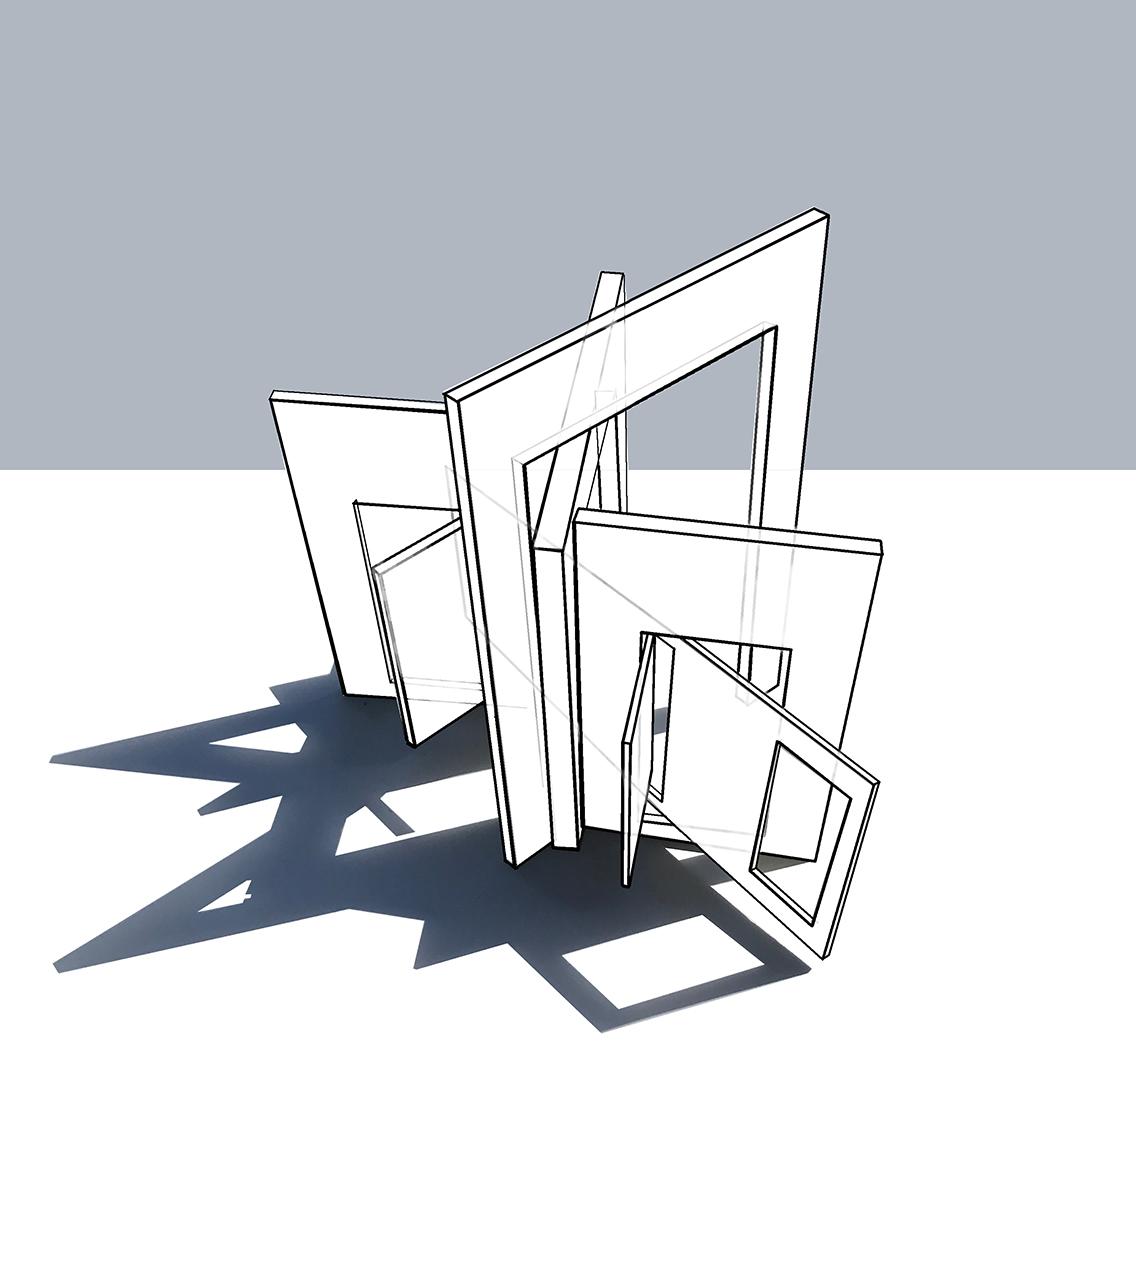 shadow and line.jpg